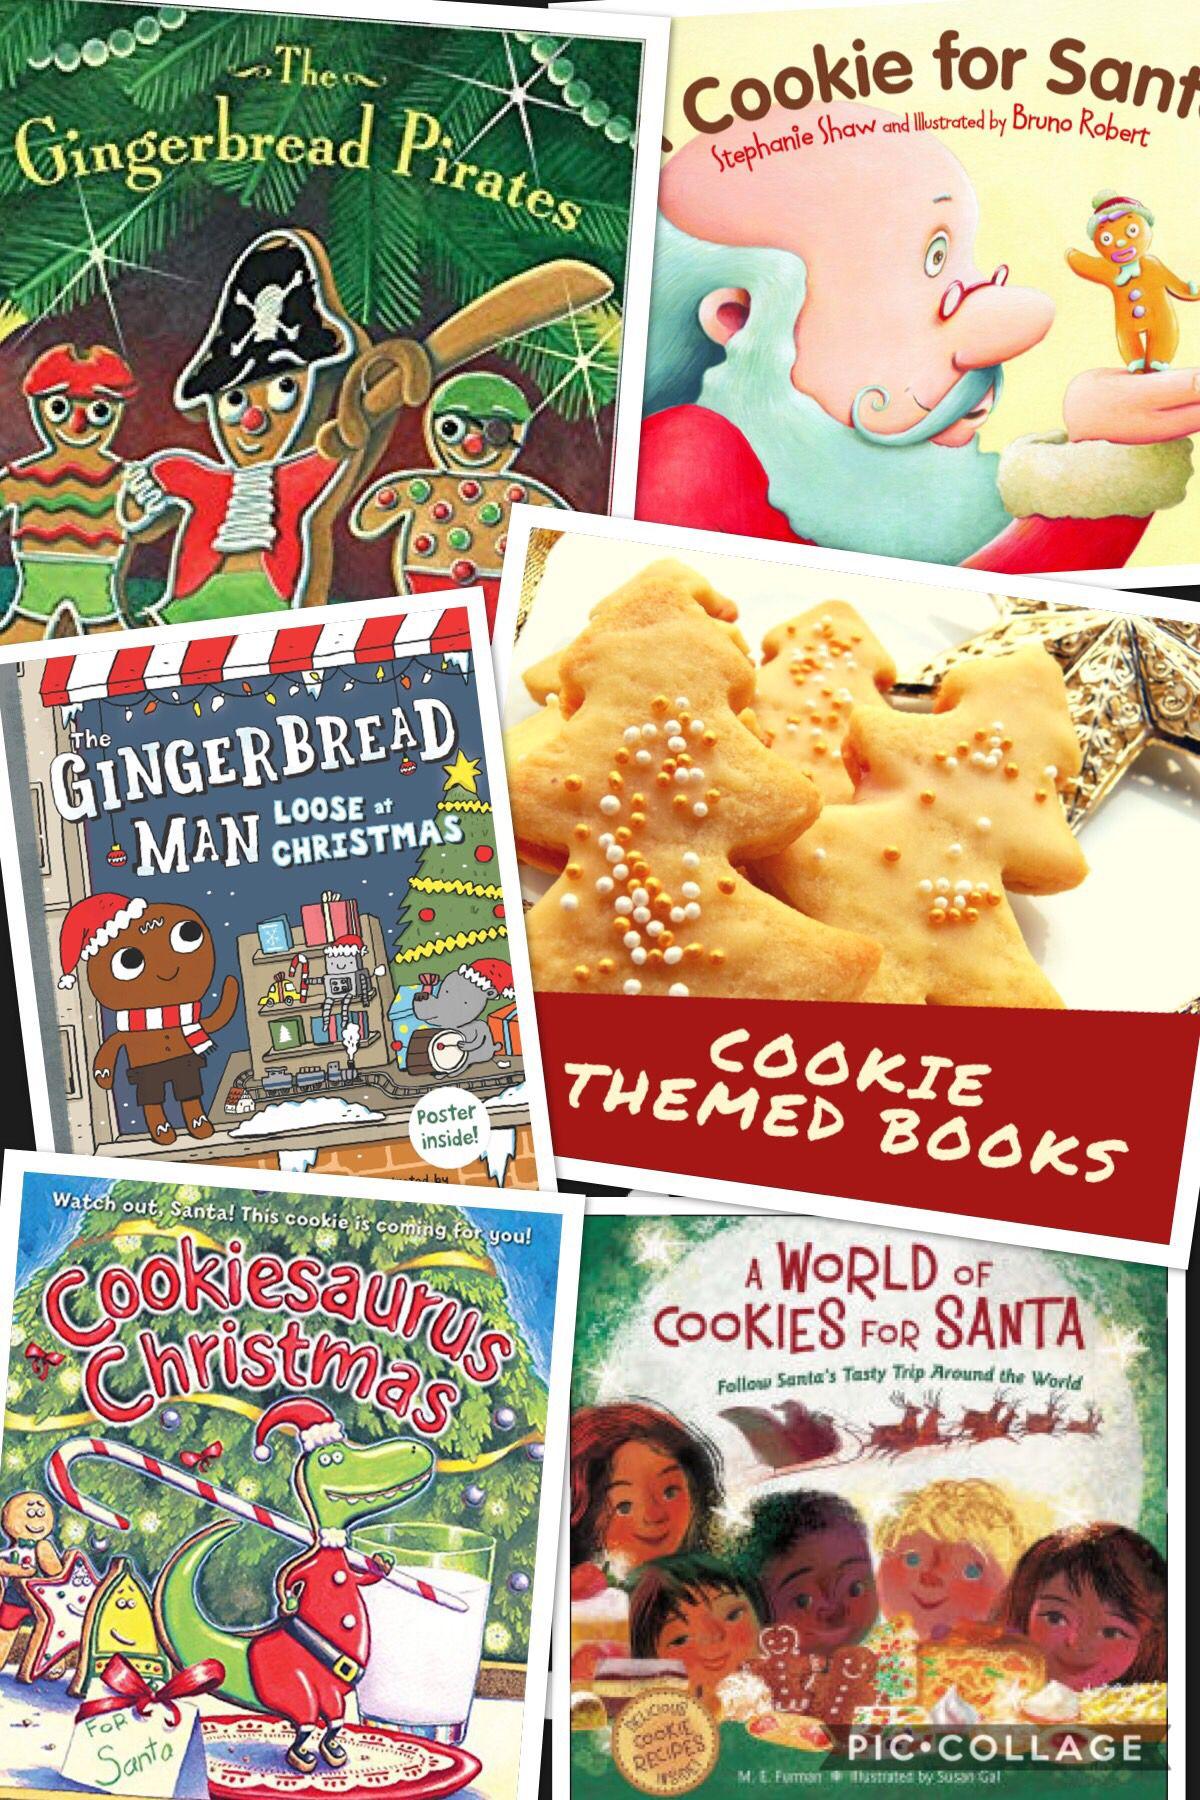 Cookie Themed Read Aloud Christmas Read Aloud Read Aloud Christmas Books